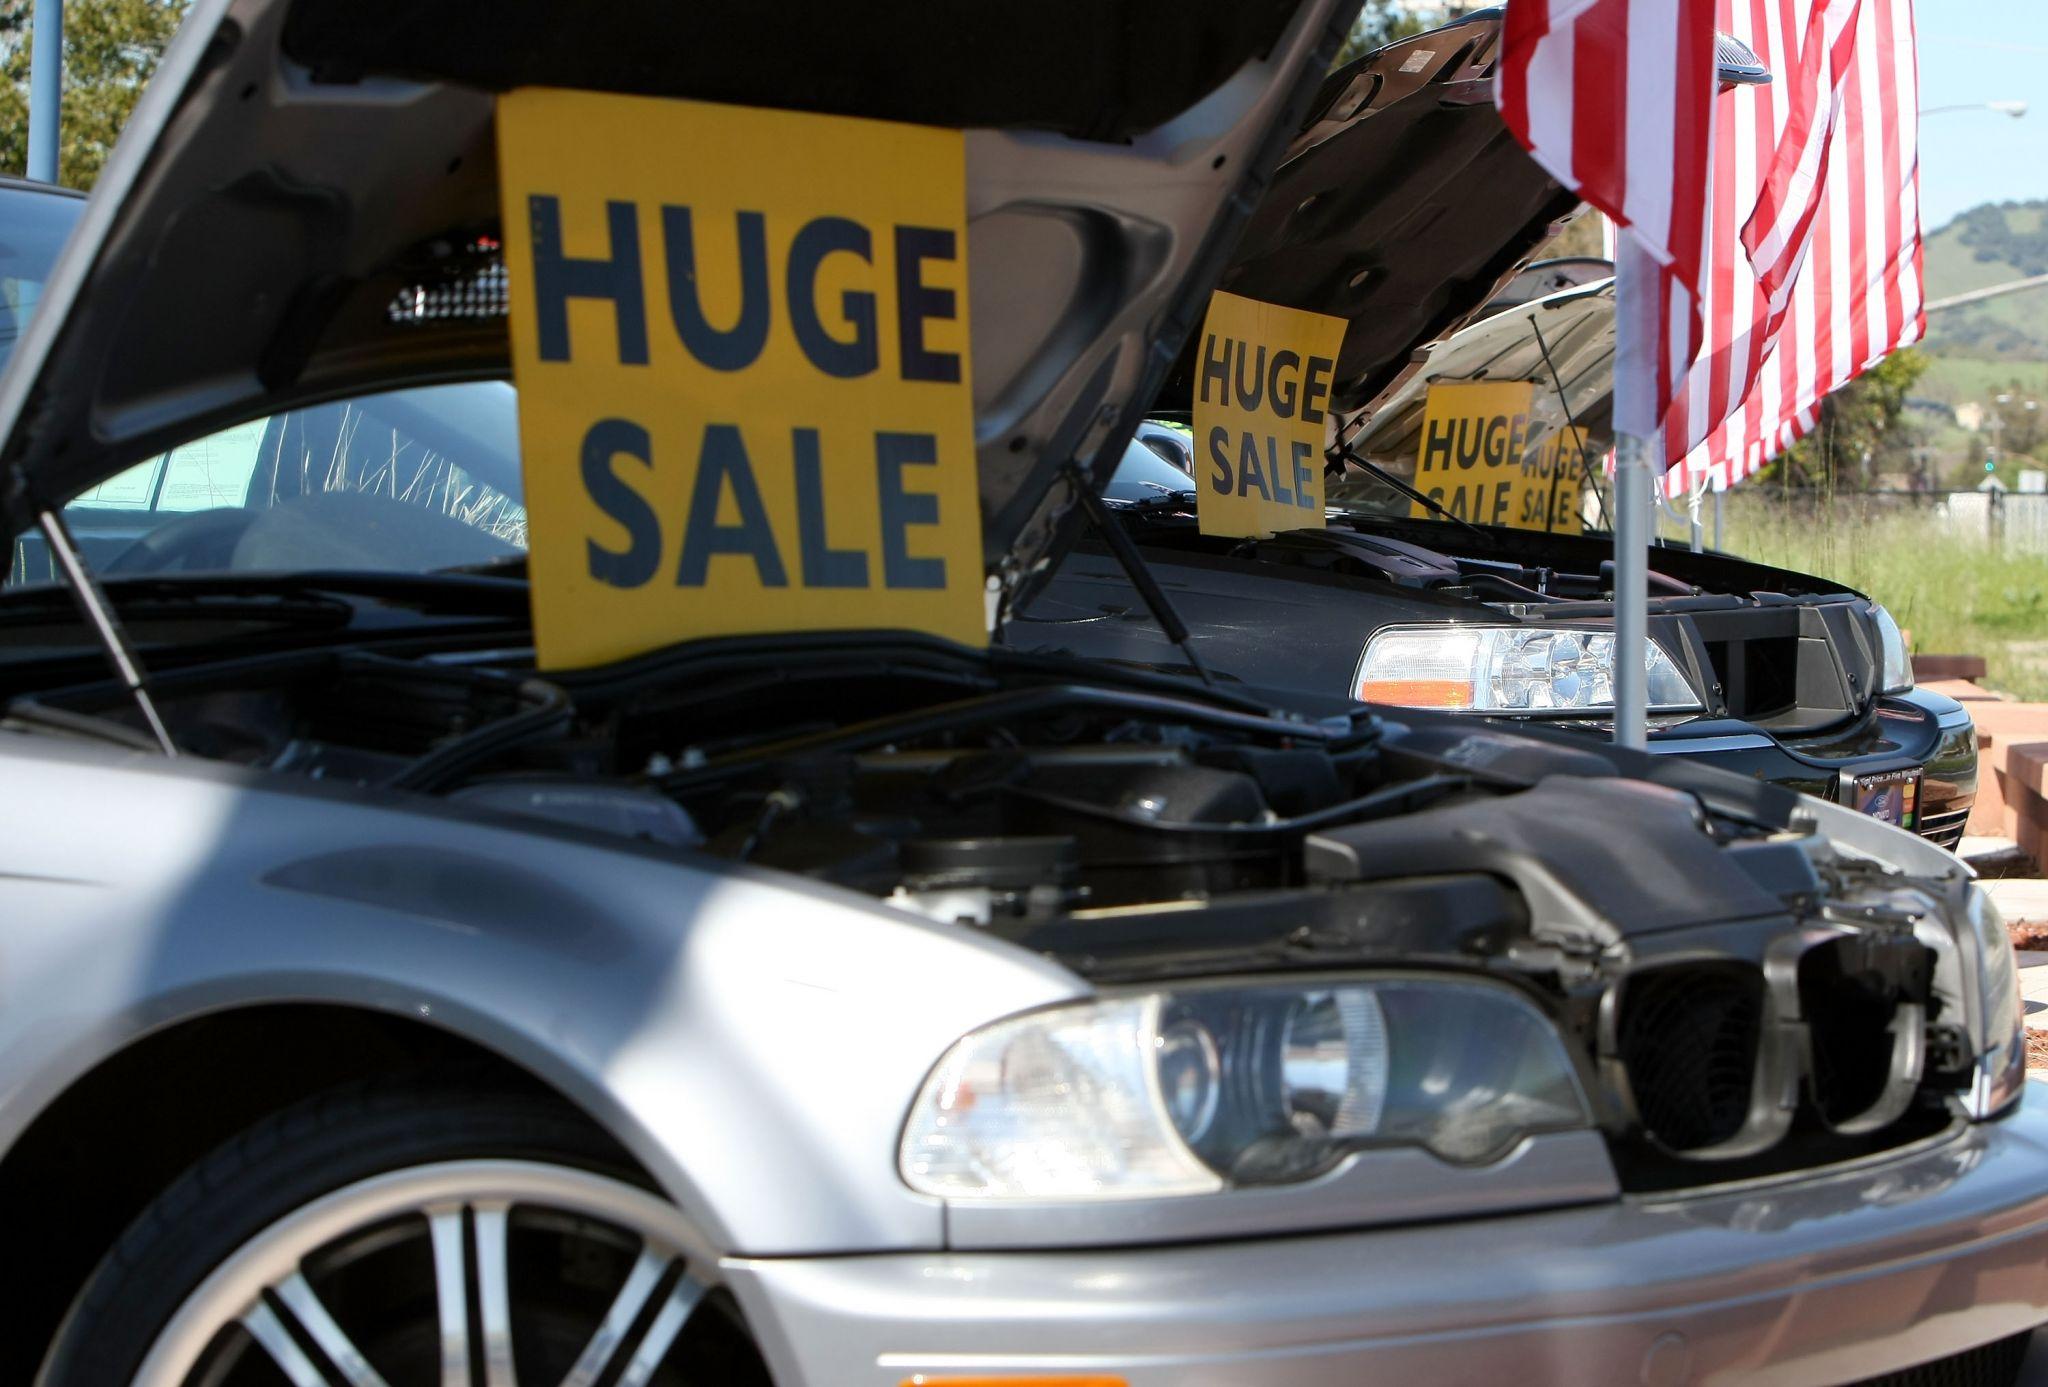 Unappealingly hilarious Houston car ad goes viral Houston Chronicle